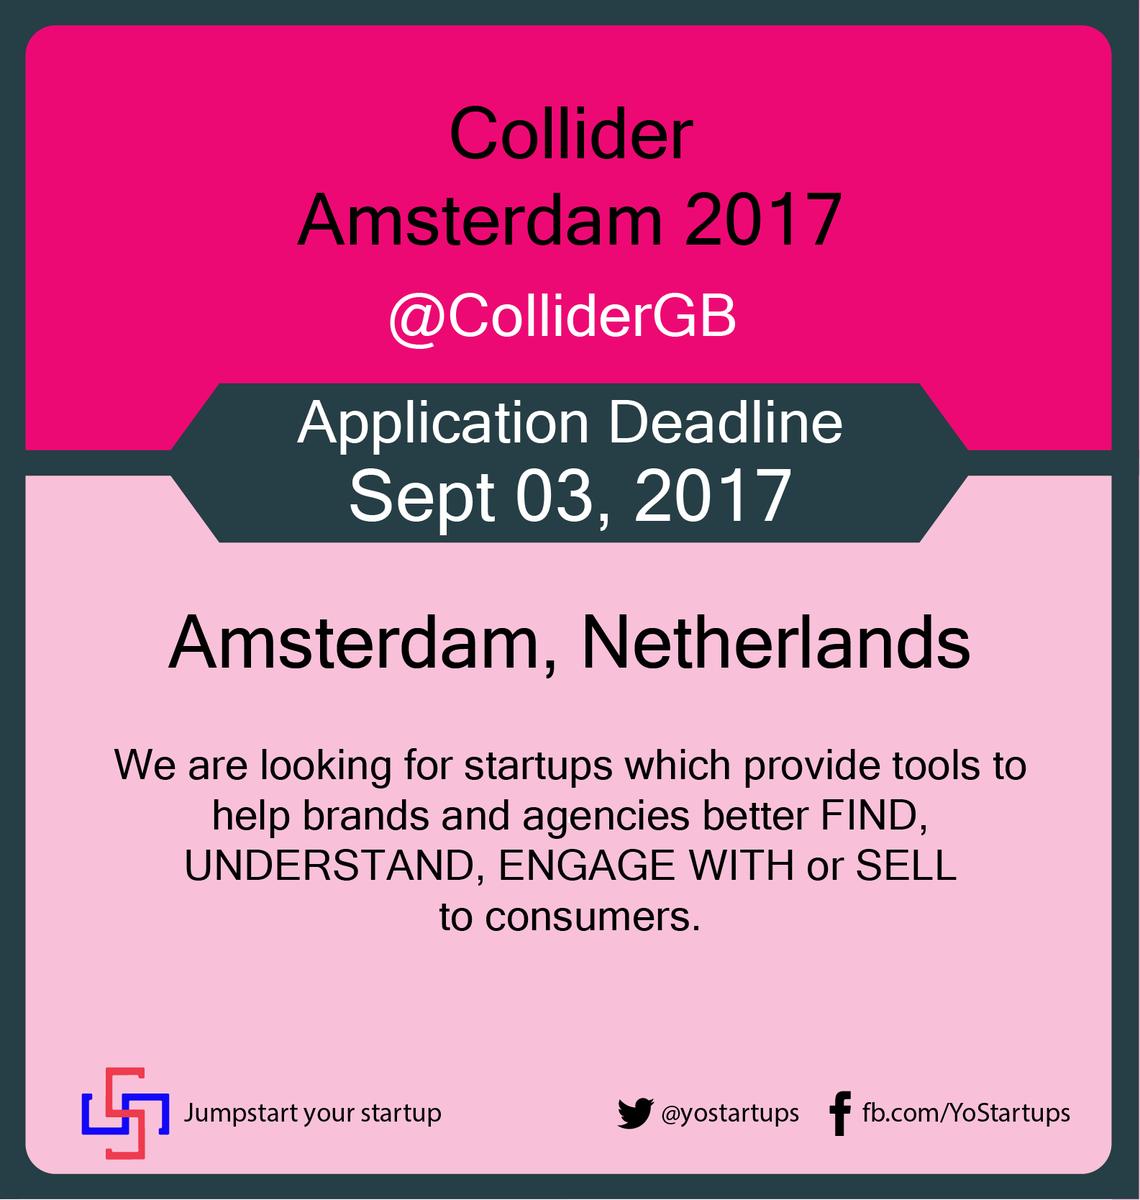 Checkout @ColliderGB accelerating #MadTech startups to UK &amp; Amsterdam markets #accelerator #YoStartups  https:// goo.gl/W8qoJL  &nbsp;  <br>http://pic.twitter.com/T82SHoQUfO